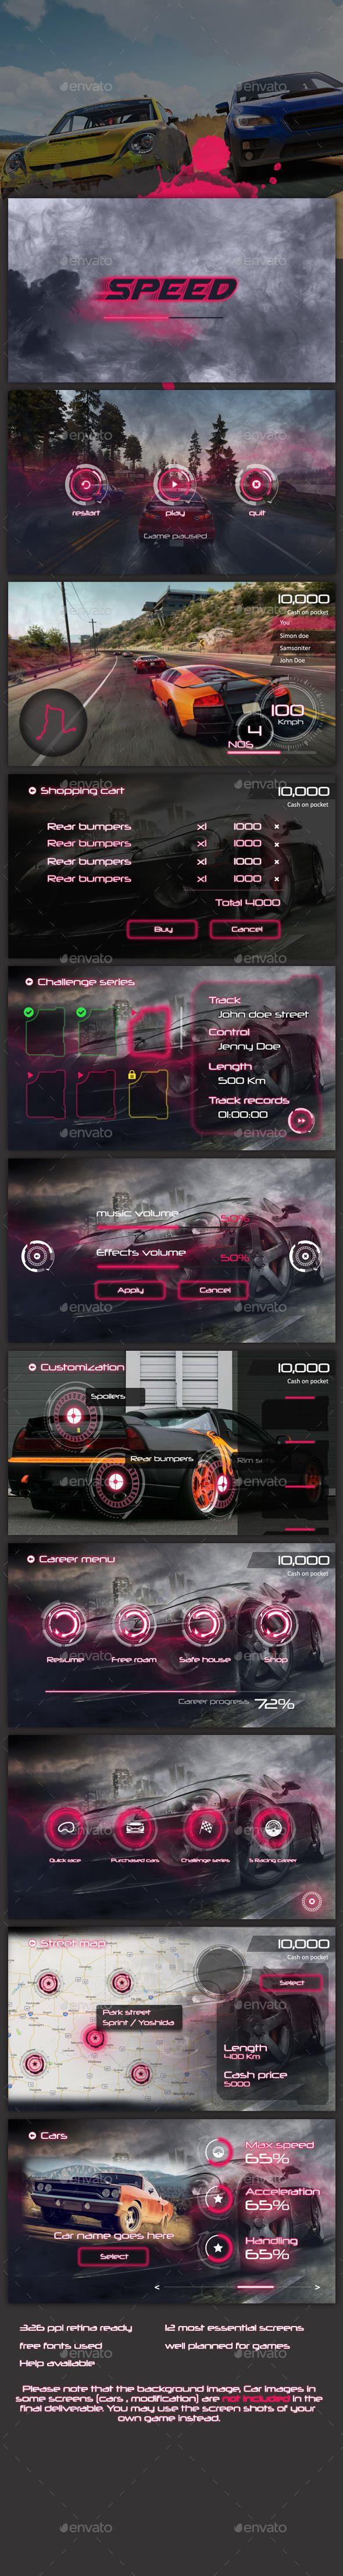 Sci-fi Racing Game UI PSD